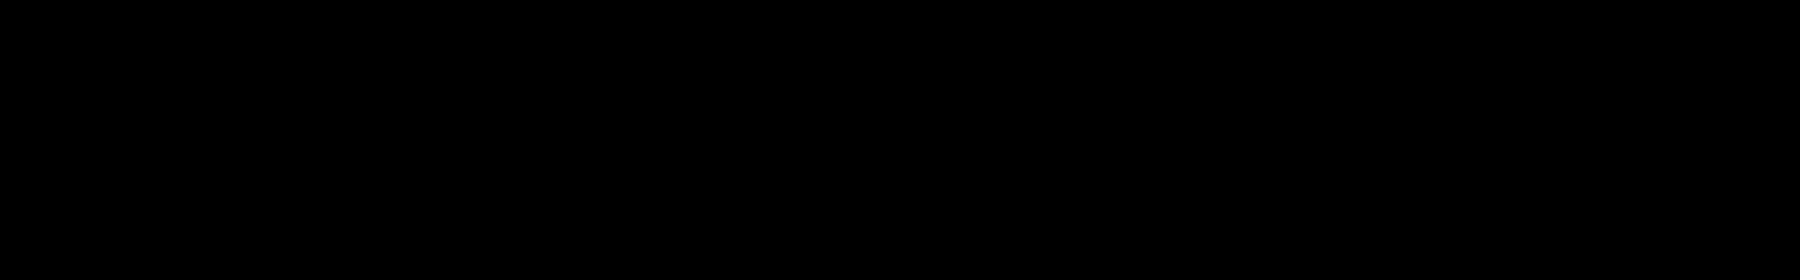 EFX audio waveform